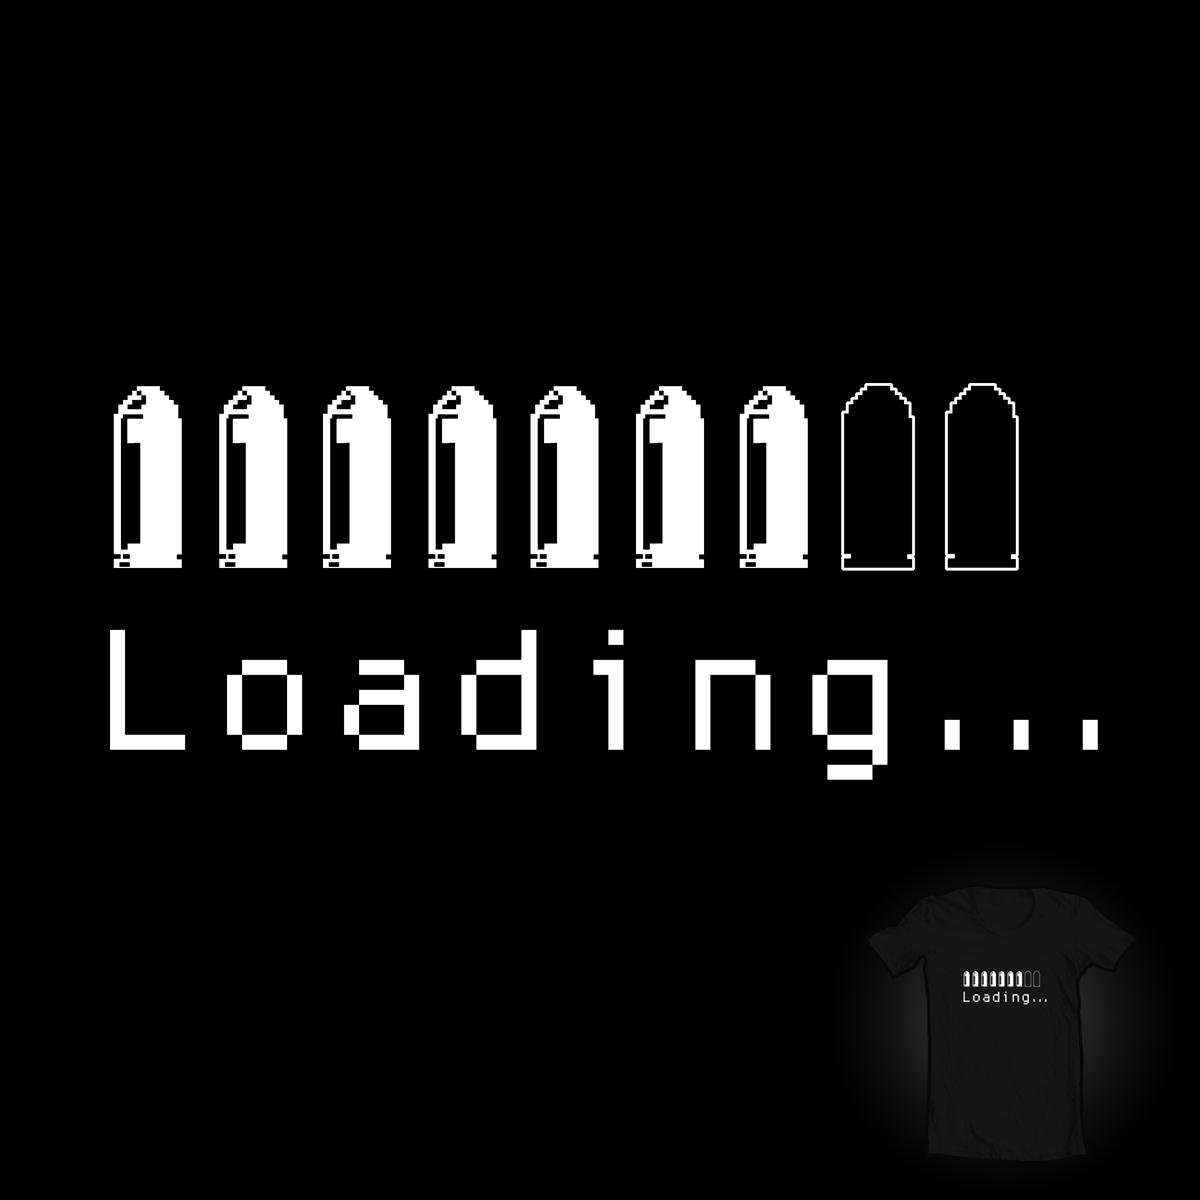 Loading... by Evan_Luza on Threadless